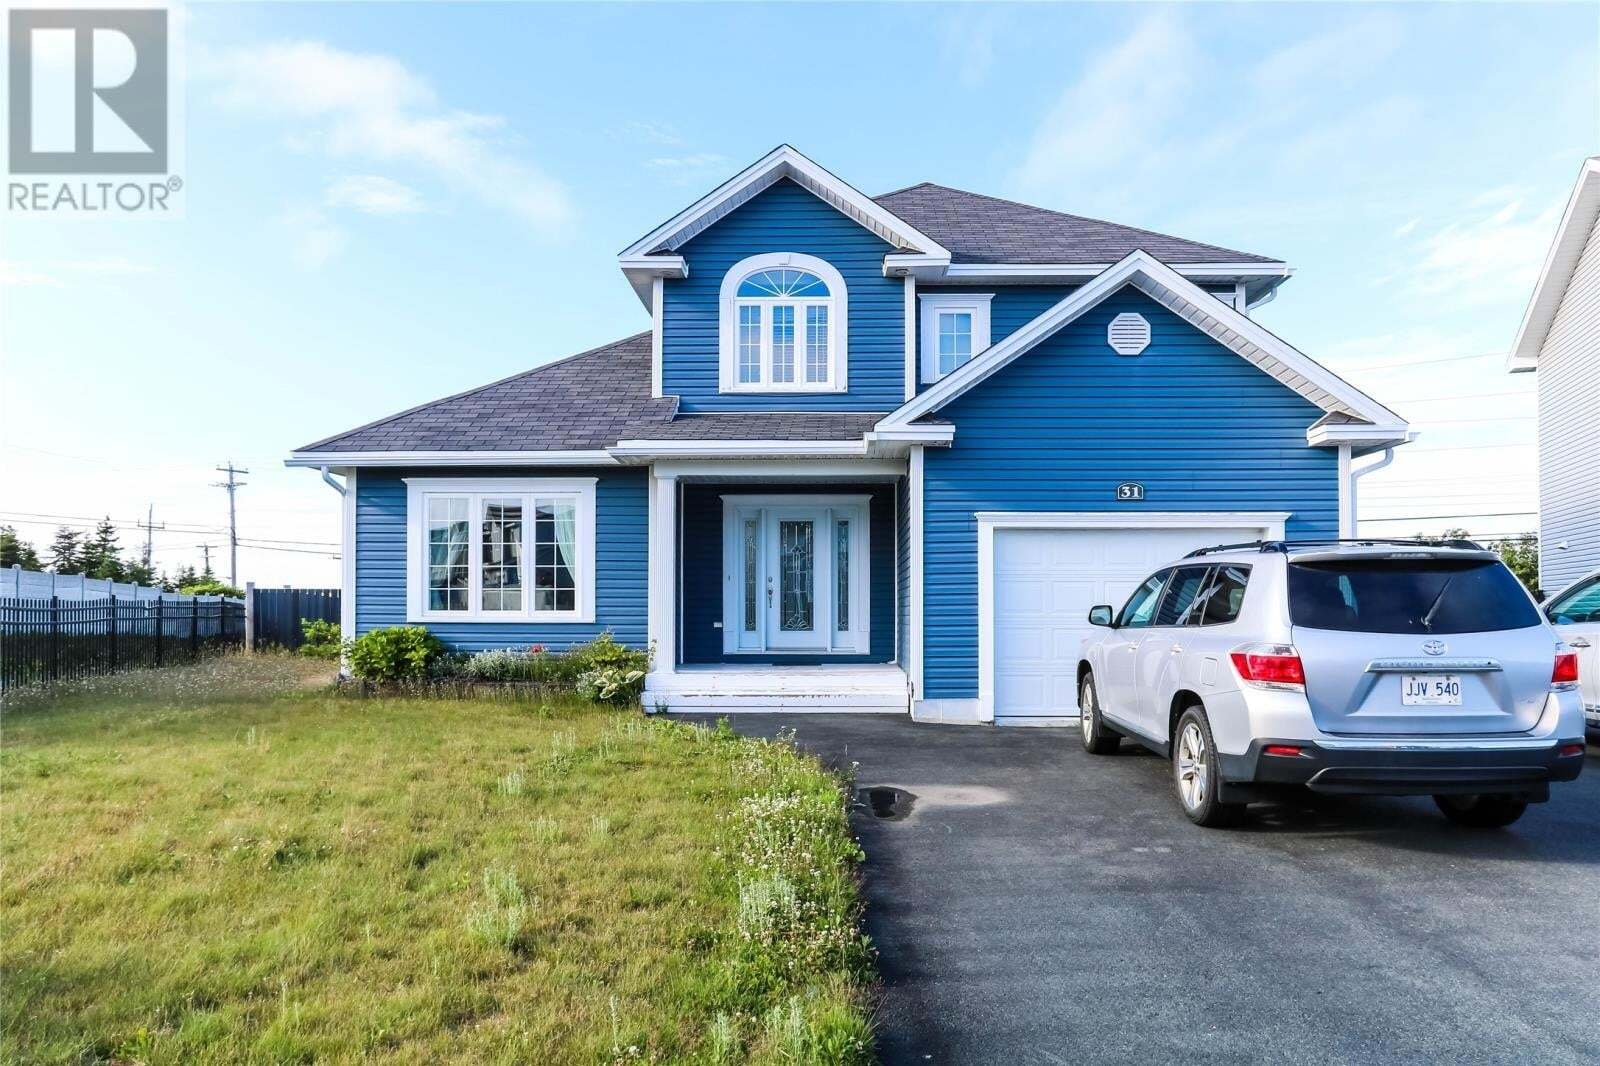 House for sale at 31 Brad Gushue Cres St. John's Newfoundland - MLS: 1221781